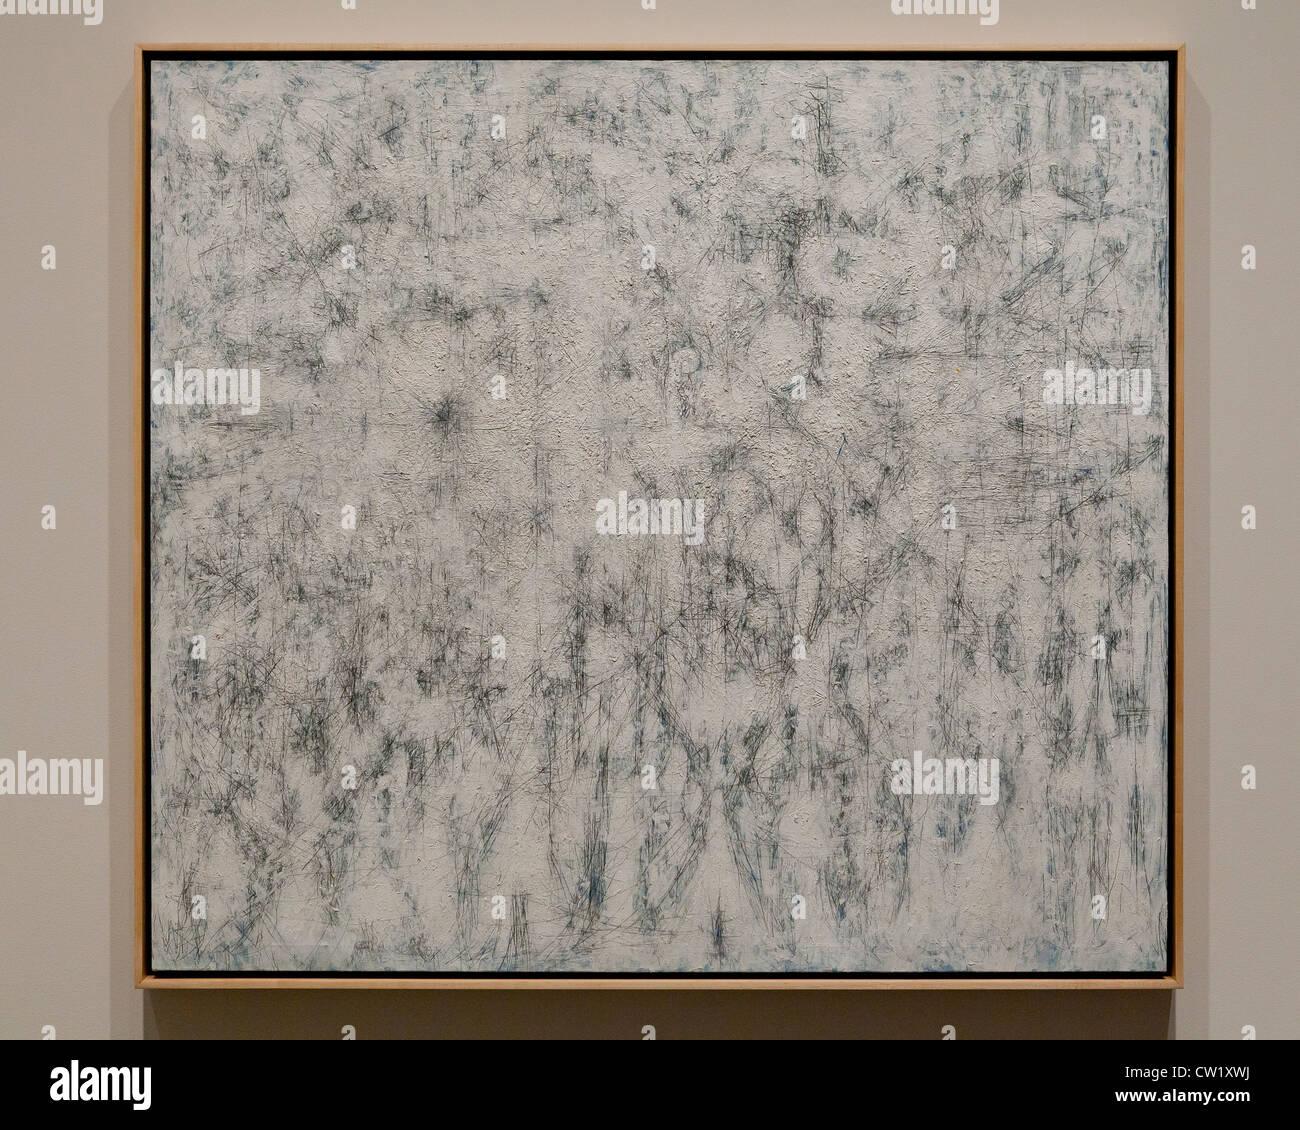 """Weiße Garten, Himmel"" von Richard Pousette-Dart, 1951 - Smithsonian National Gallery of Art, Washington, Stockbild"